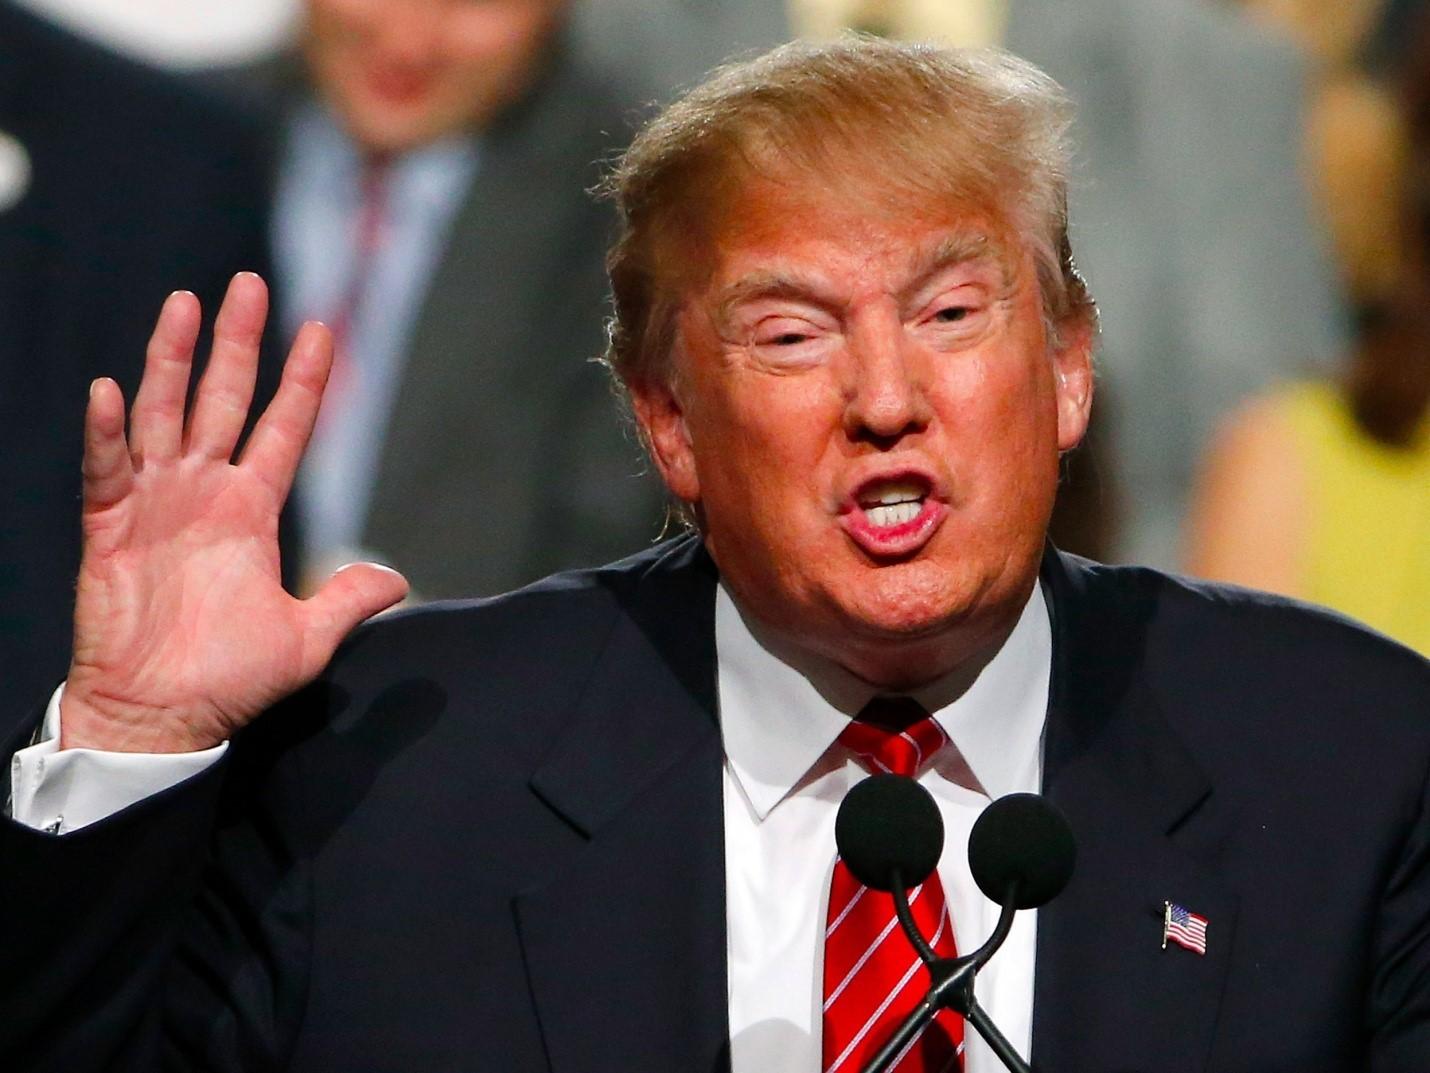 Новые санкции вотношении РФ одобрил президент США